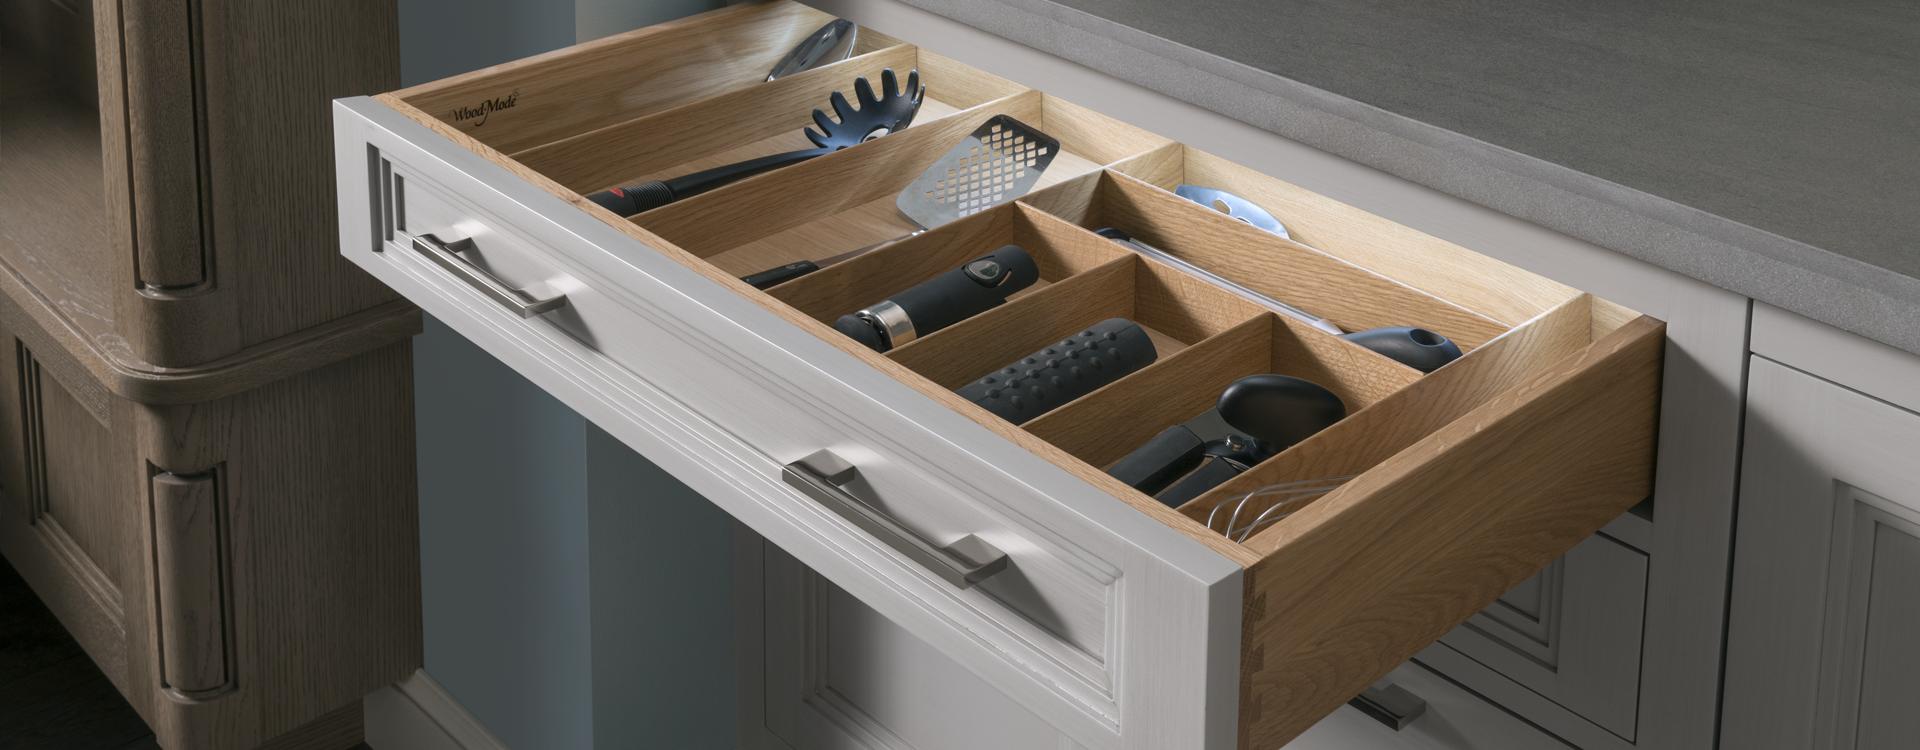 Wood-Mode Fine Custom Cabinetry Image